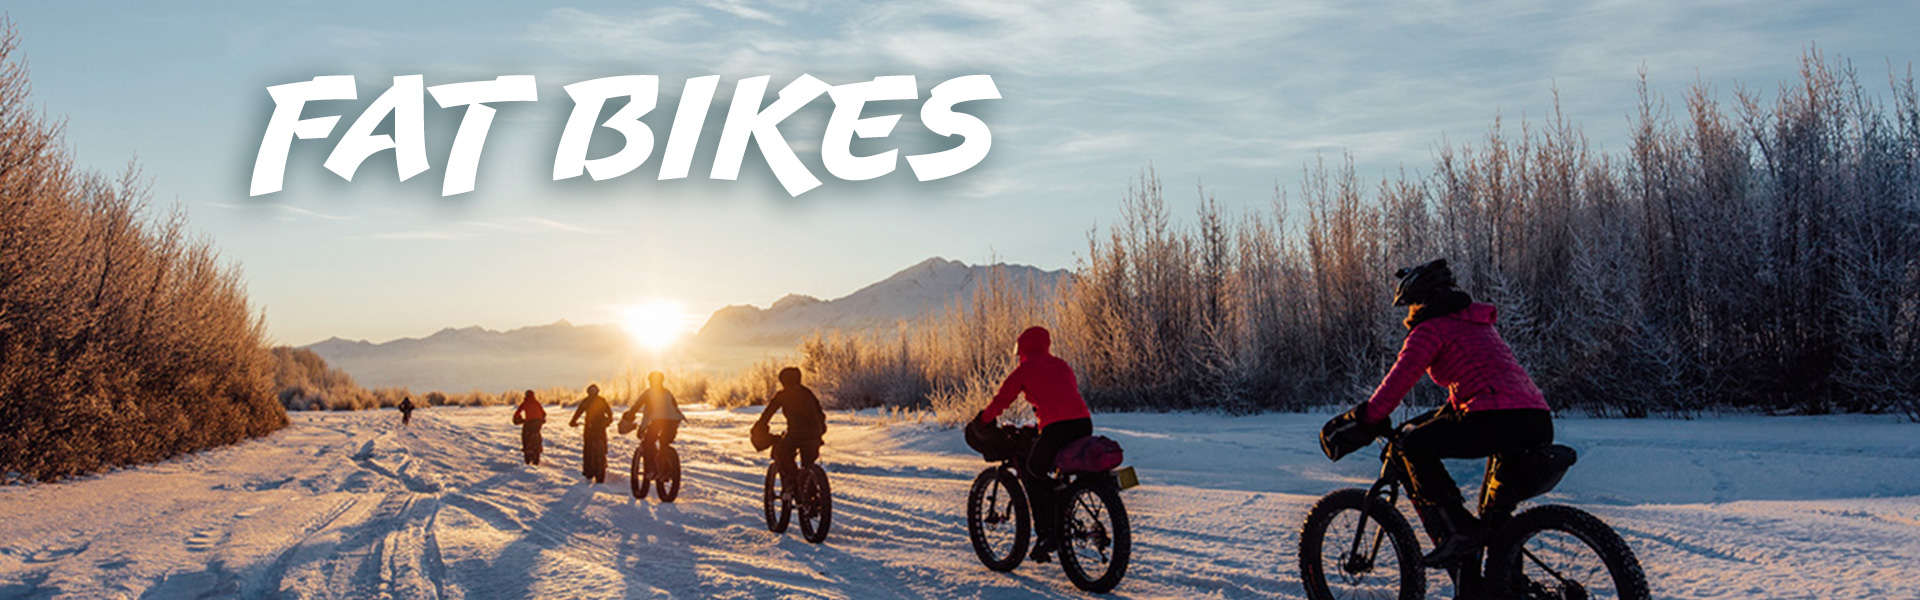 We ride fat Bikes